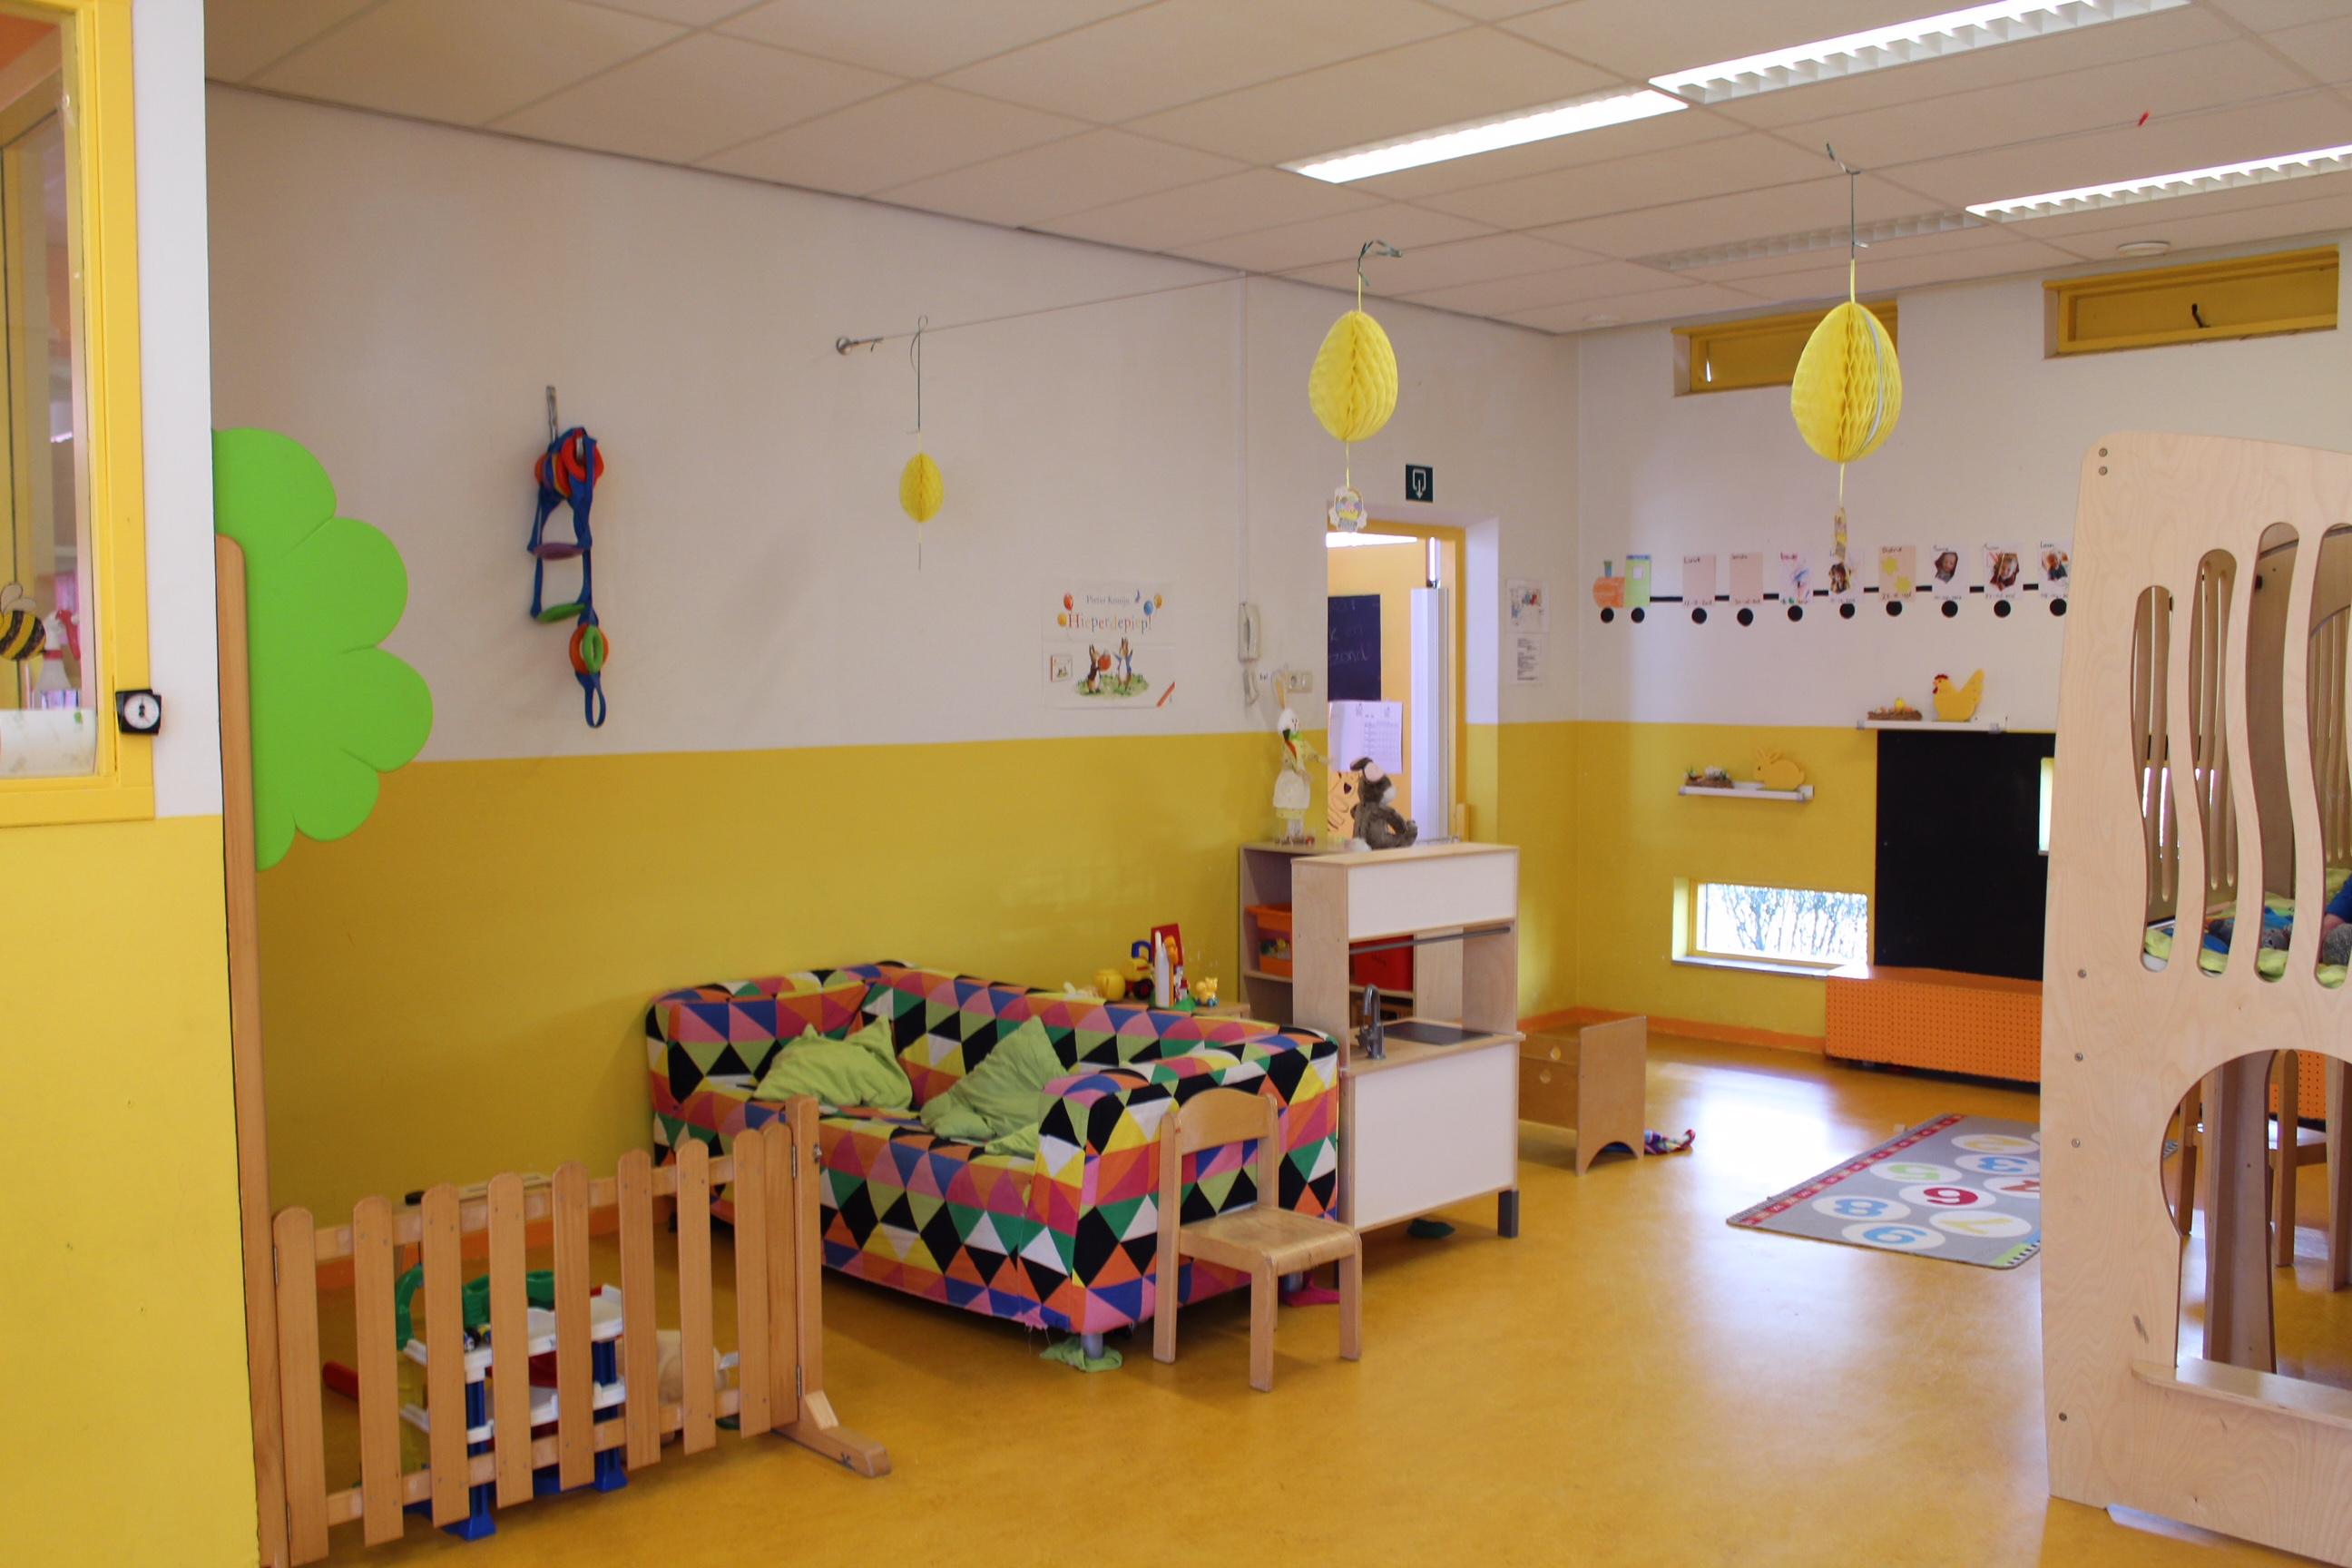 Alles Kids BSO kinderopvang Oosterpark Groningen binnenruimte